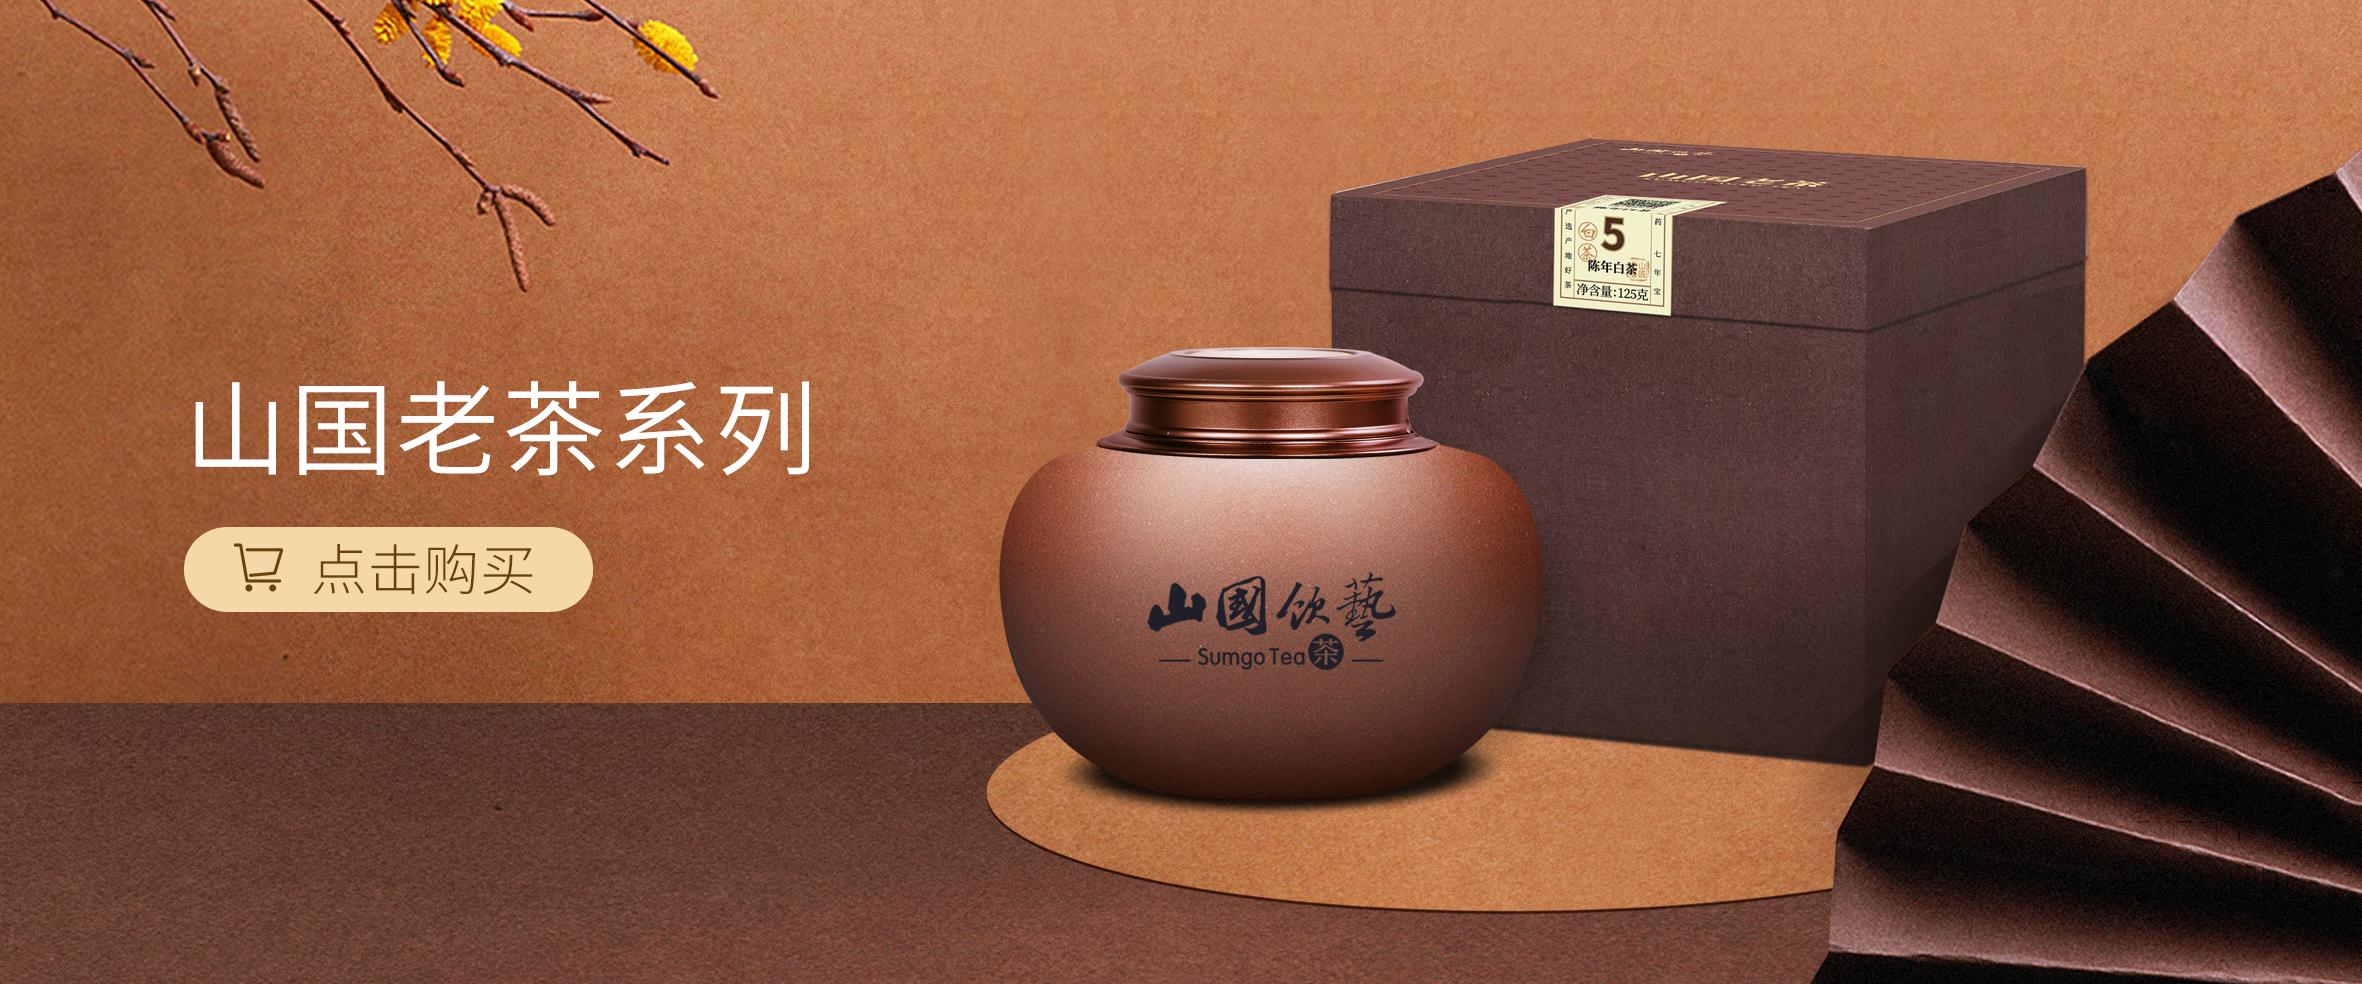 山国老茶系列banner